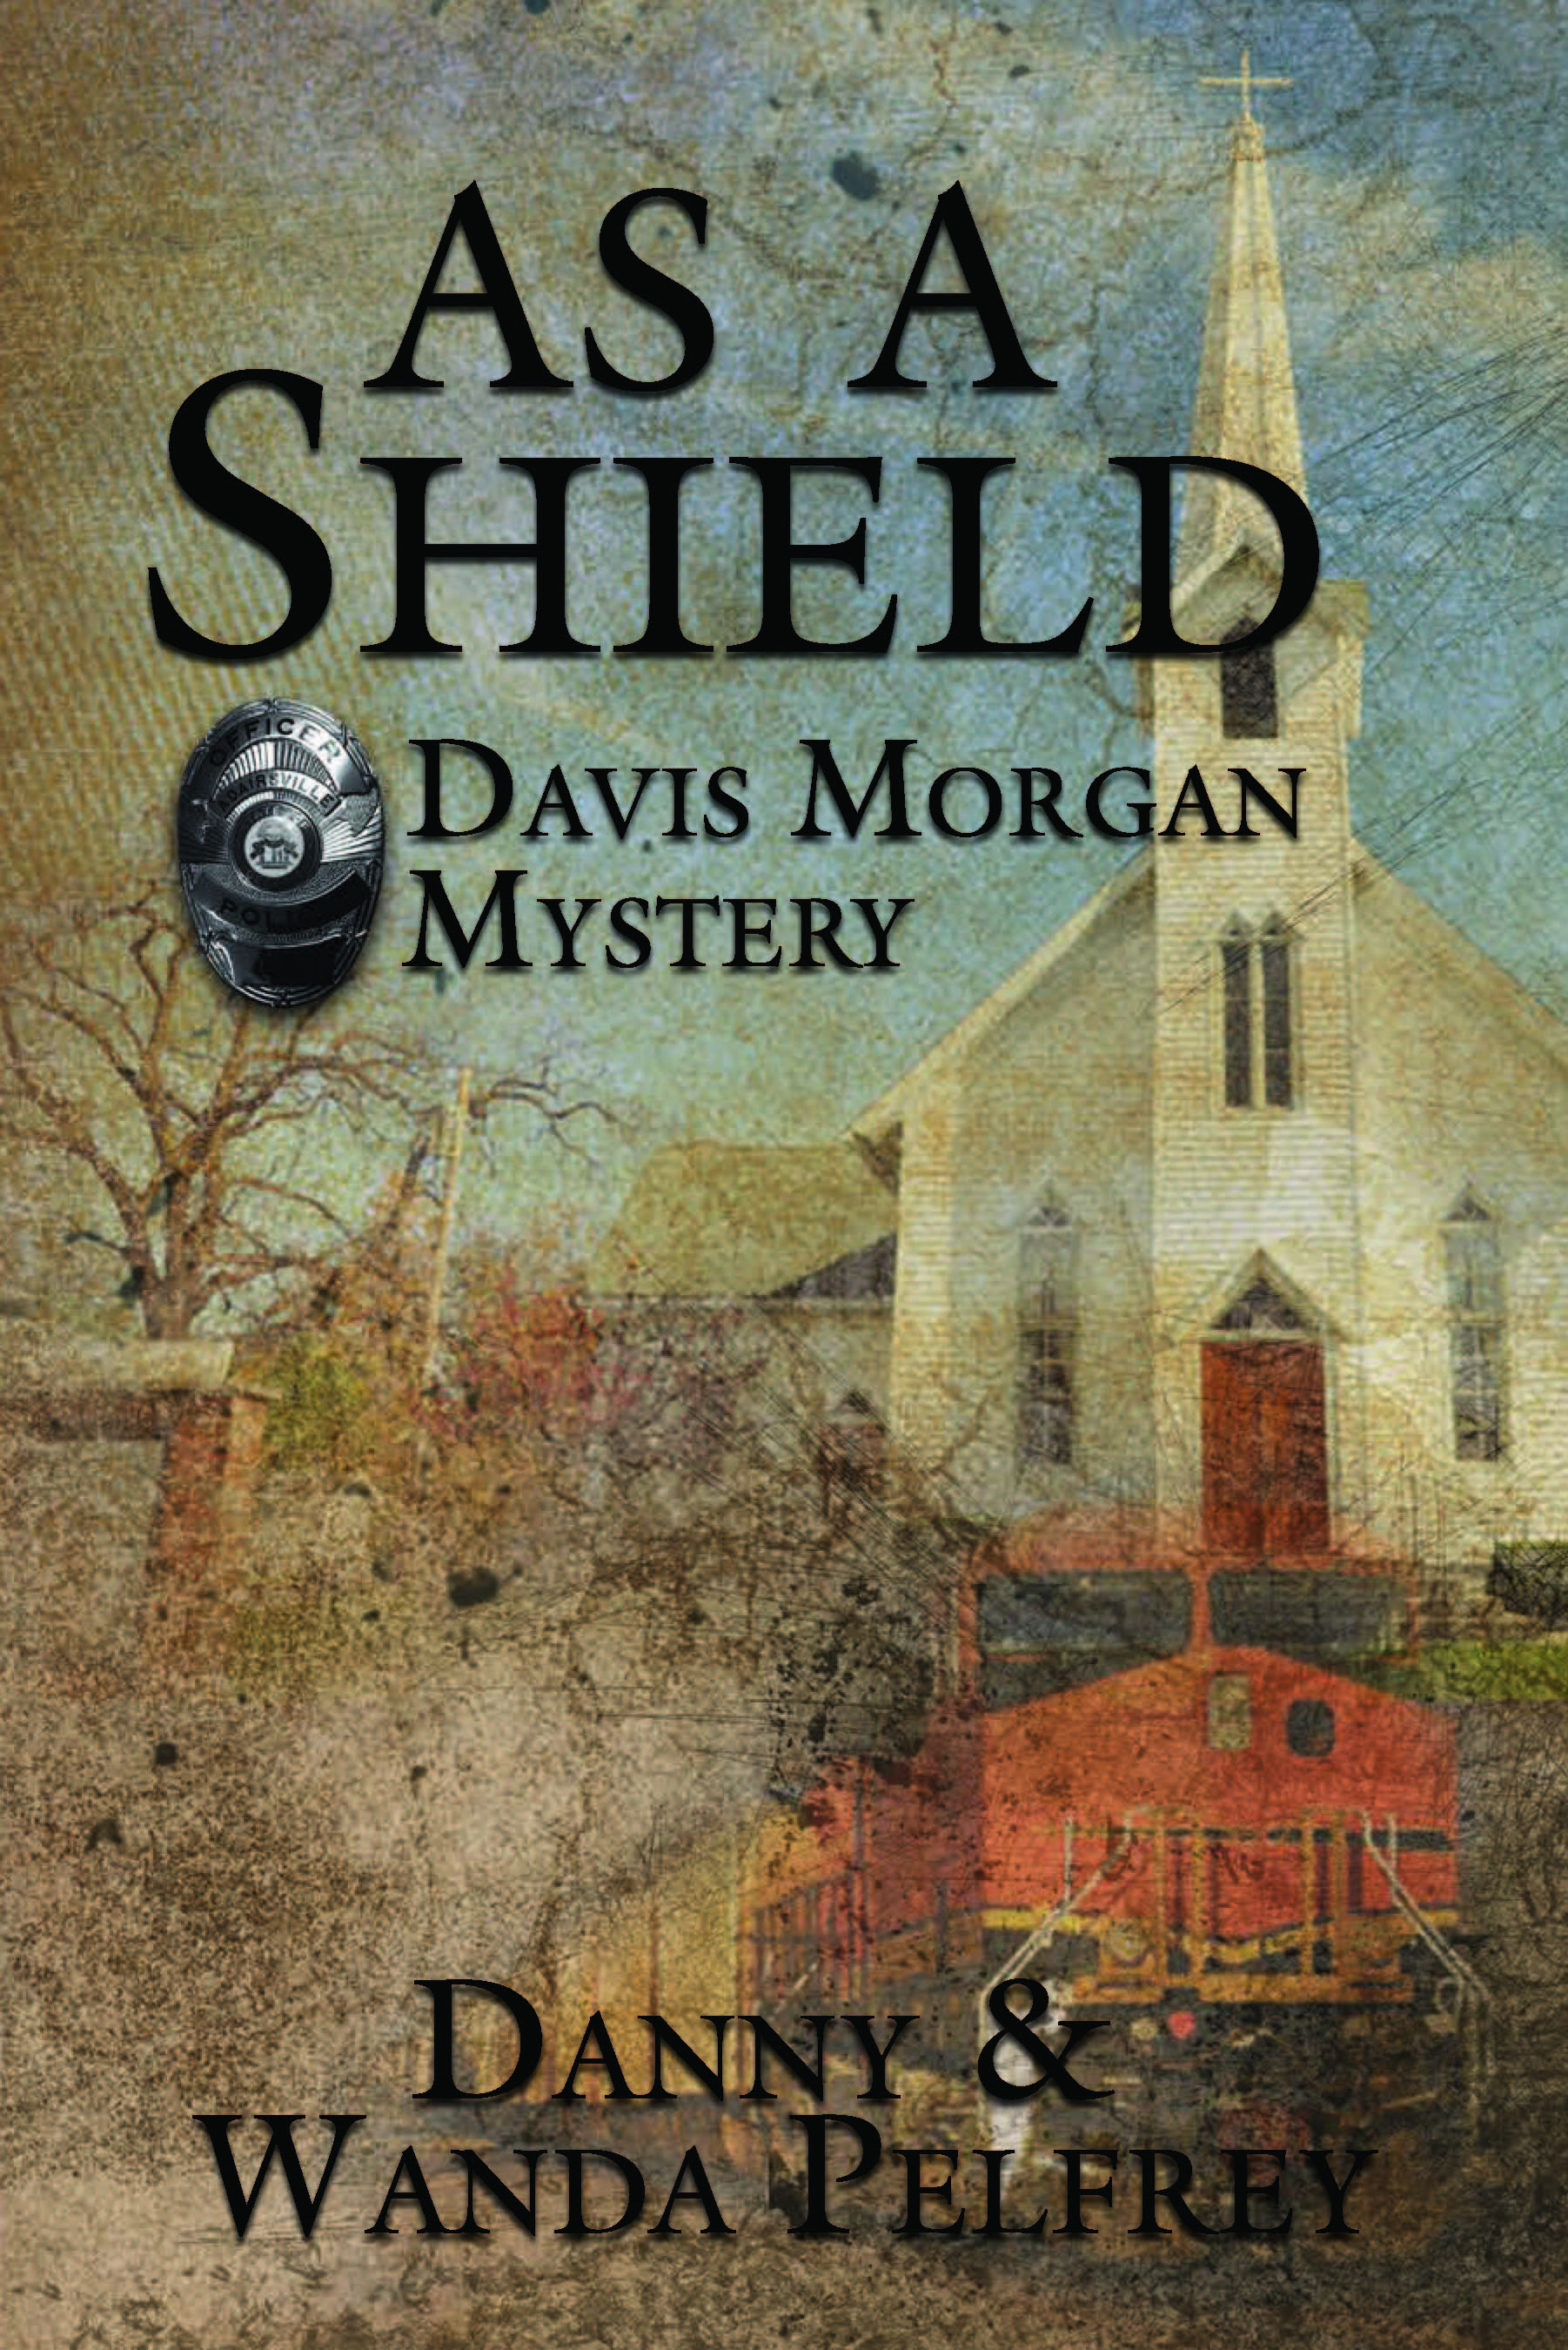 As A Shield